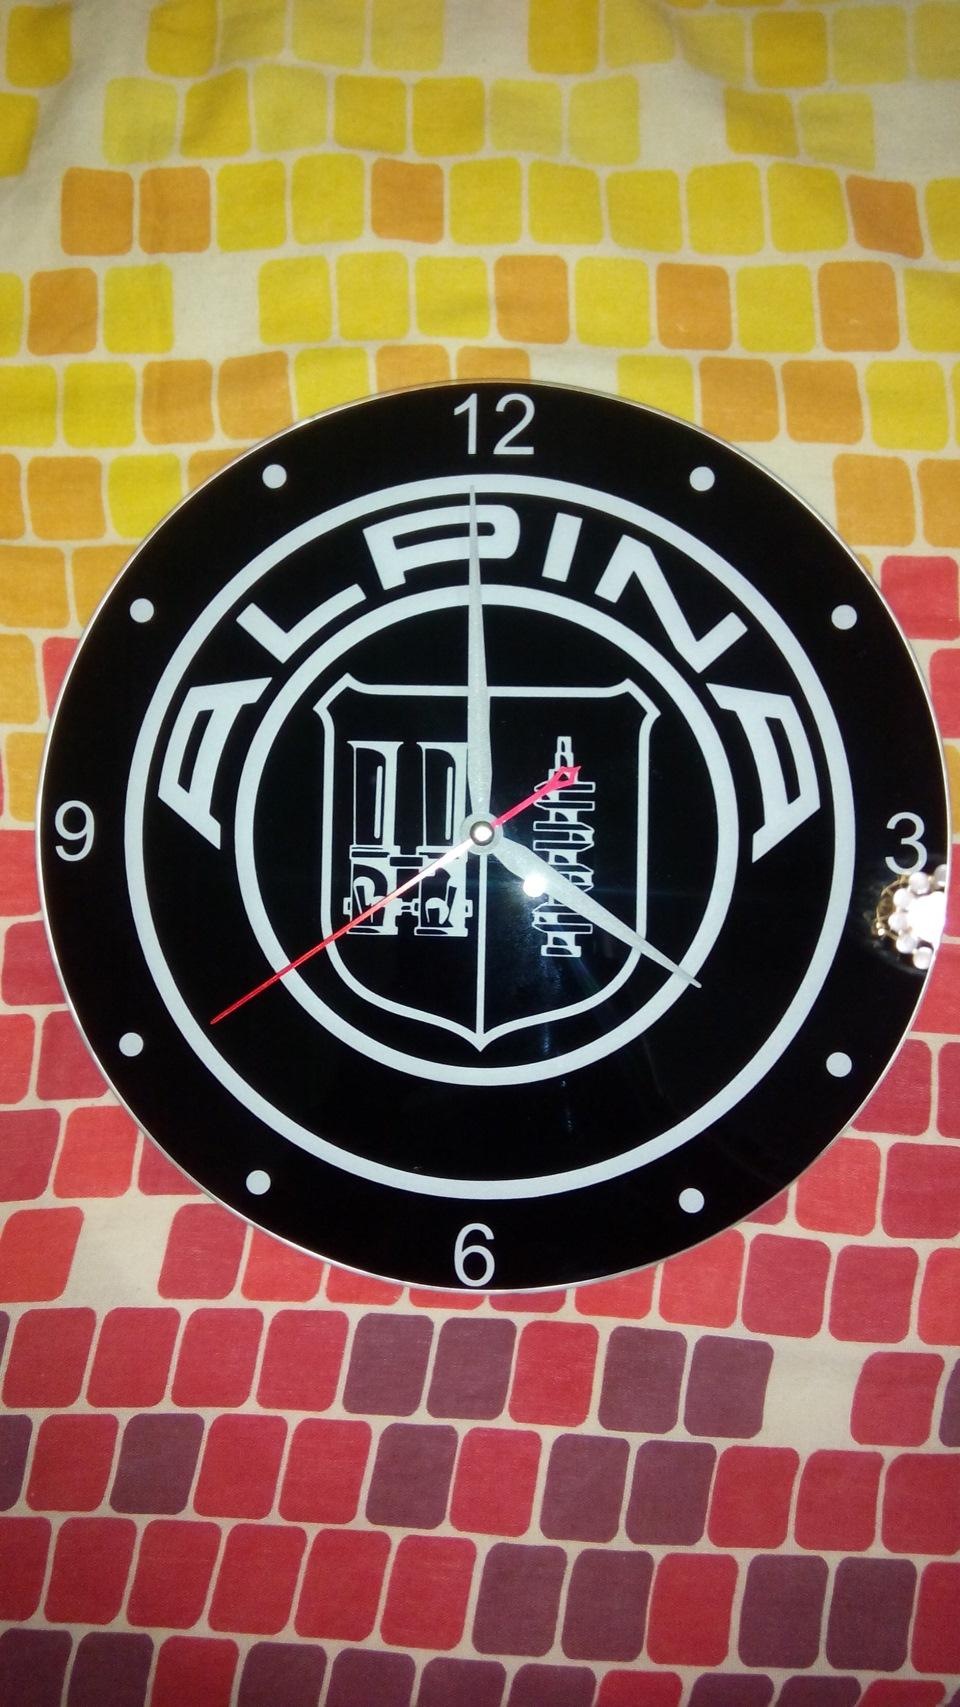 ... › ALPINA-мания) или часы на заказ: https://www.drive2.ru/l/7723439